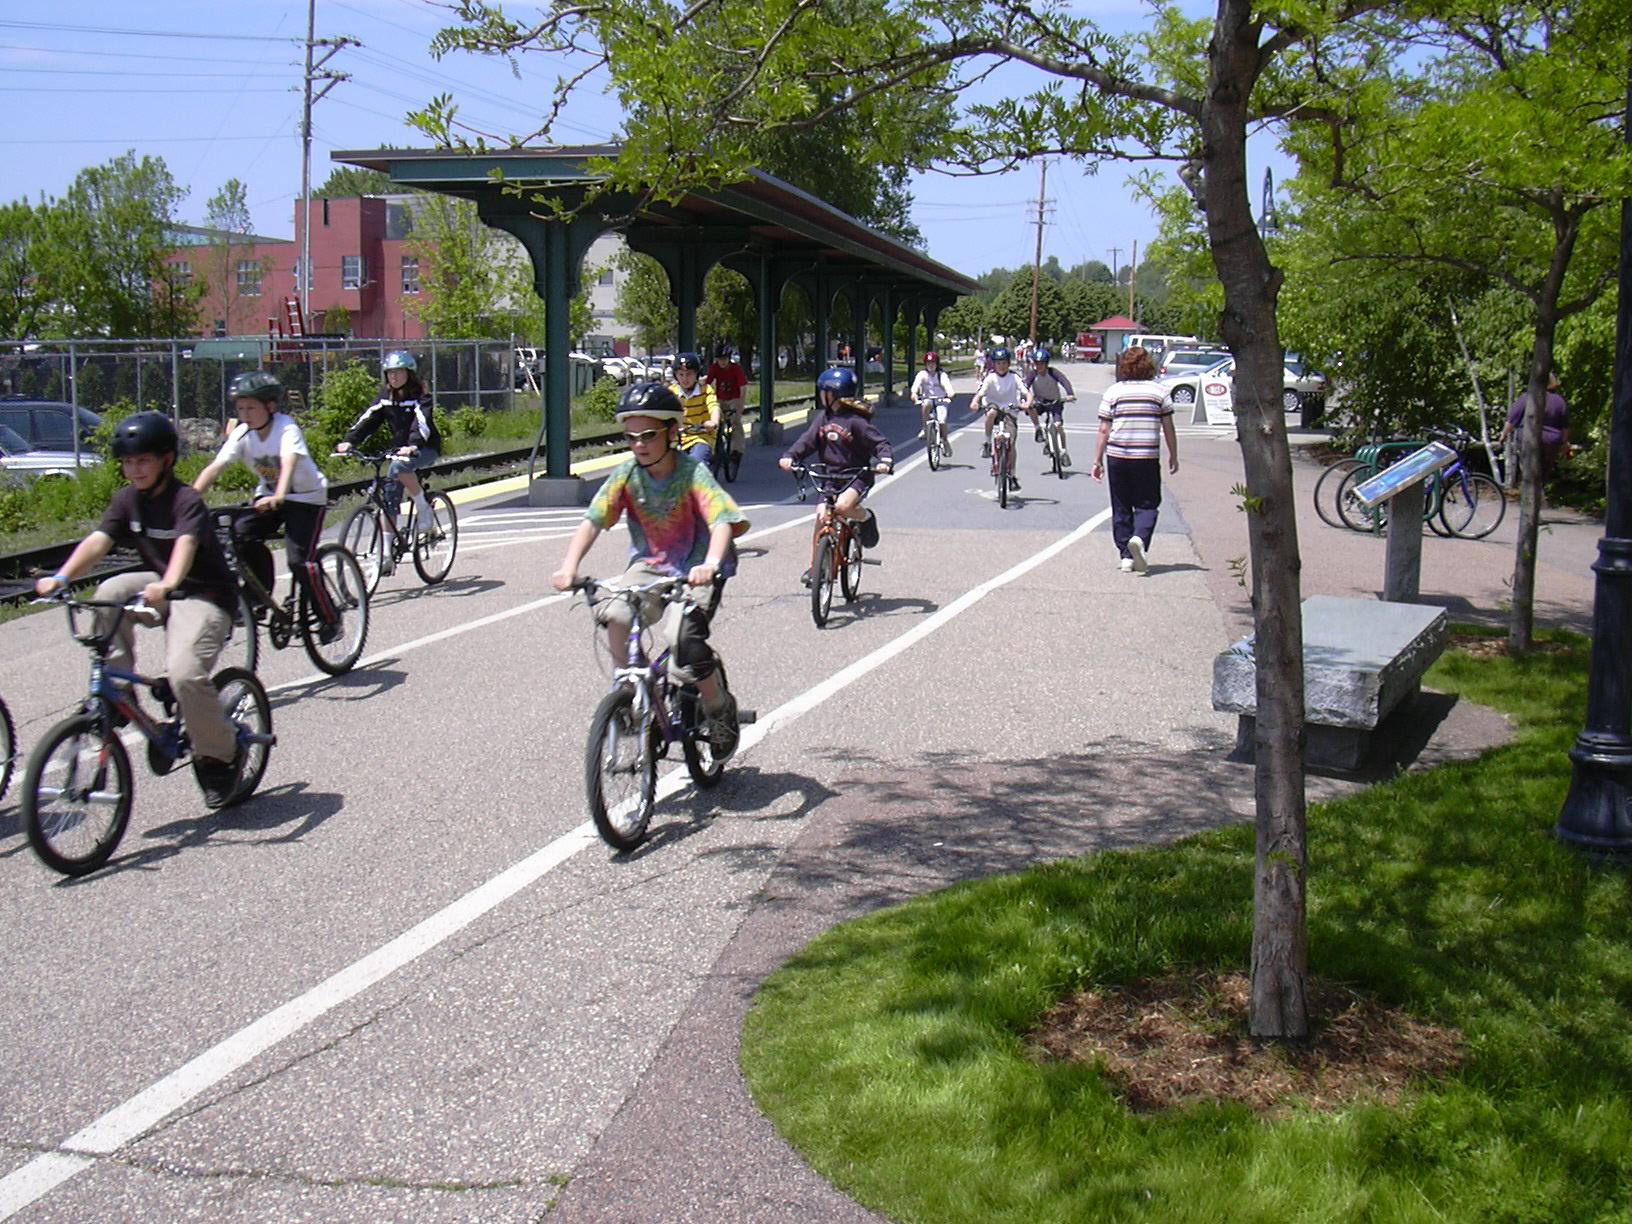 Champlain students enjoying the bike path